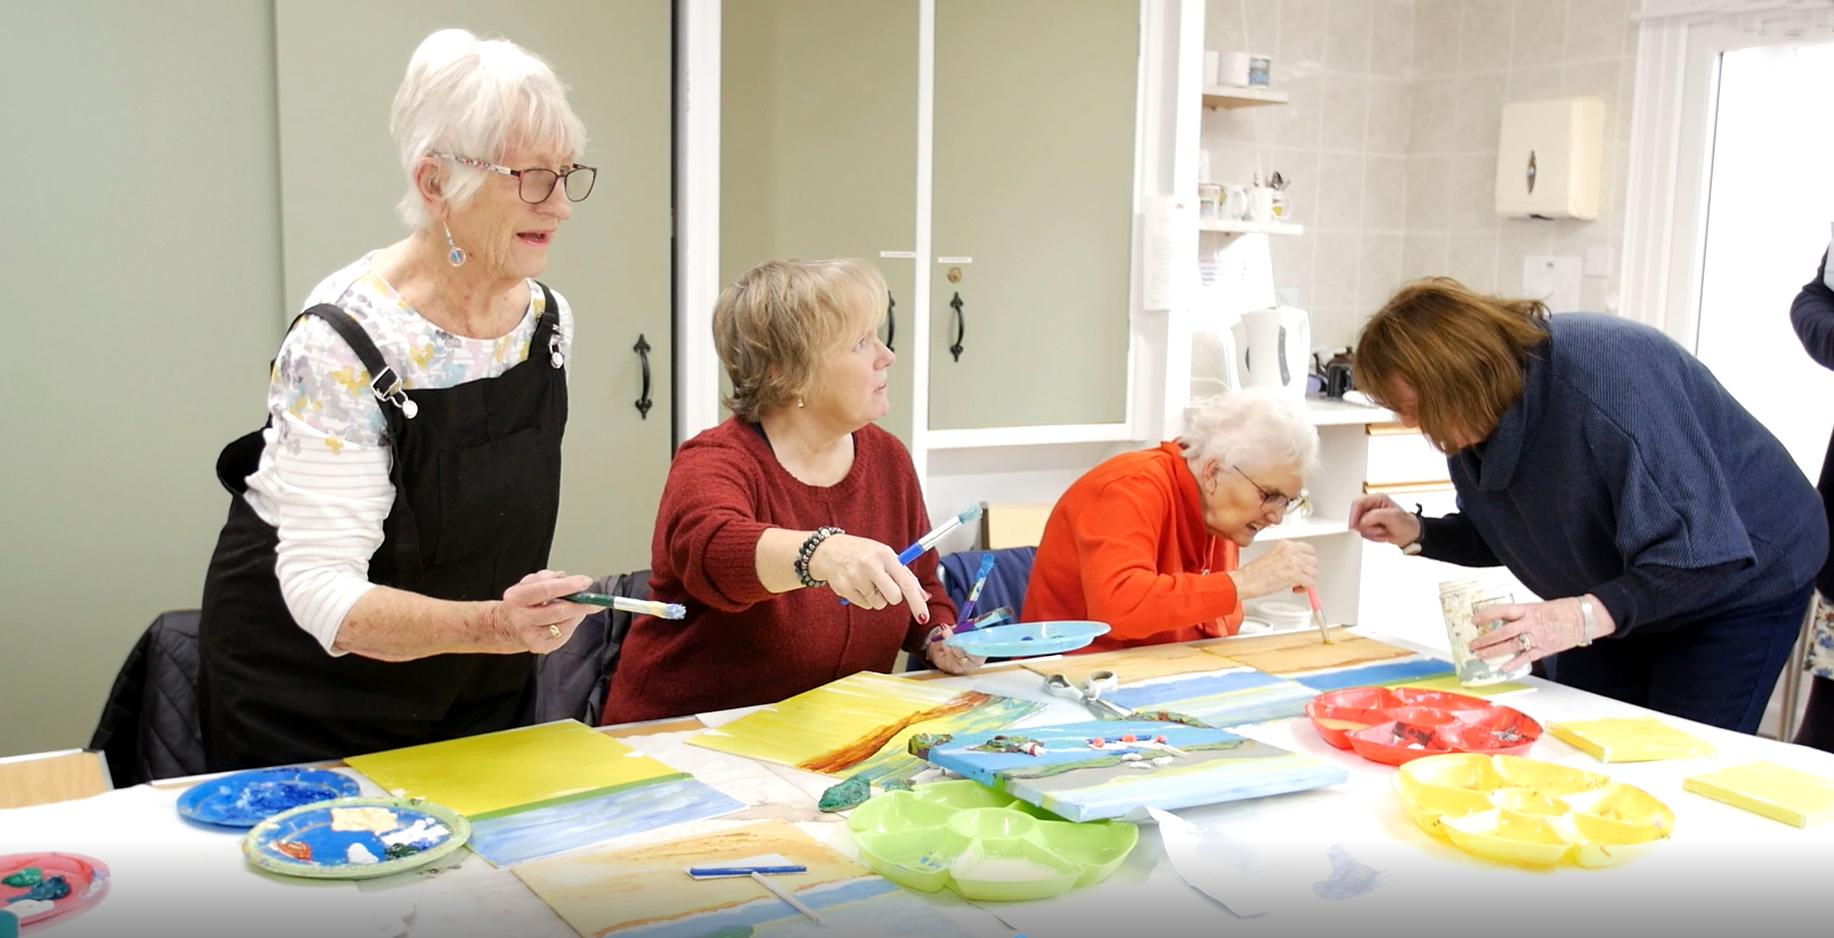 Clients at an Art Workshop